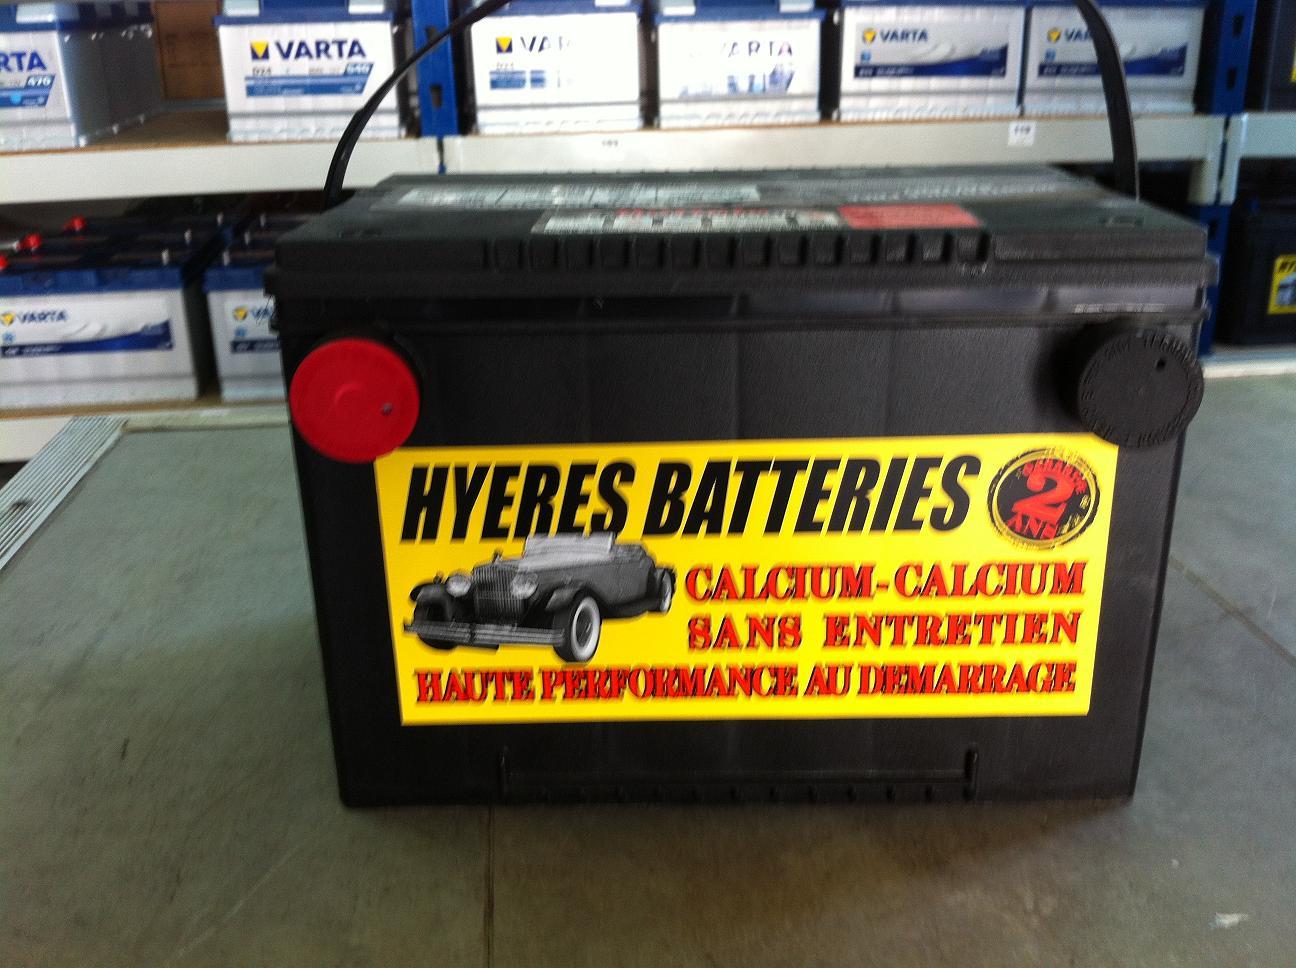 batteries pour voitures hyeres batteries. Black Bedroom Furniture Sets. Home Design Ideas